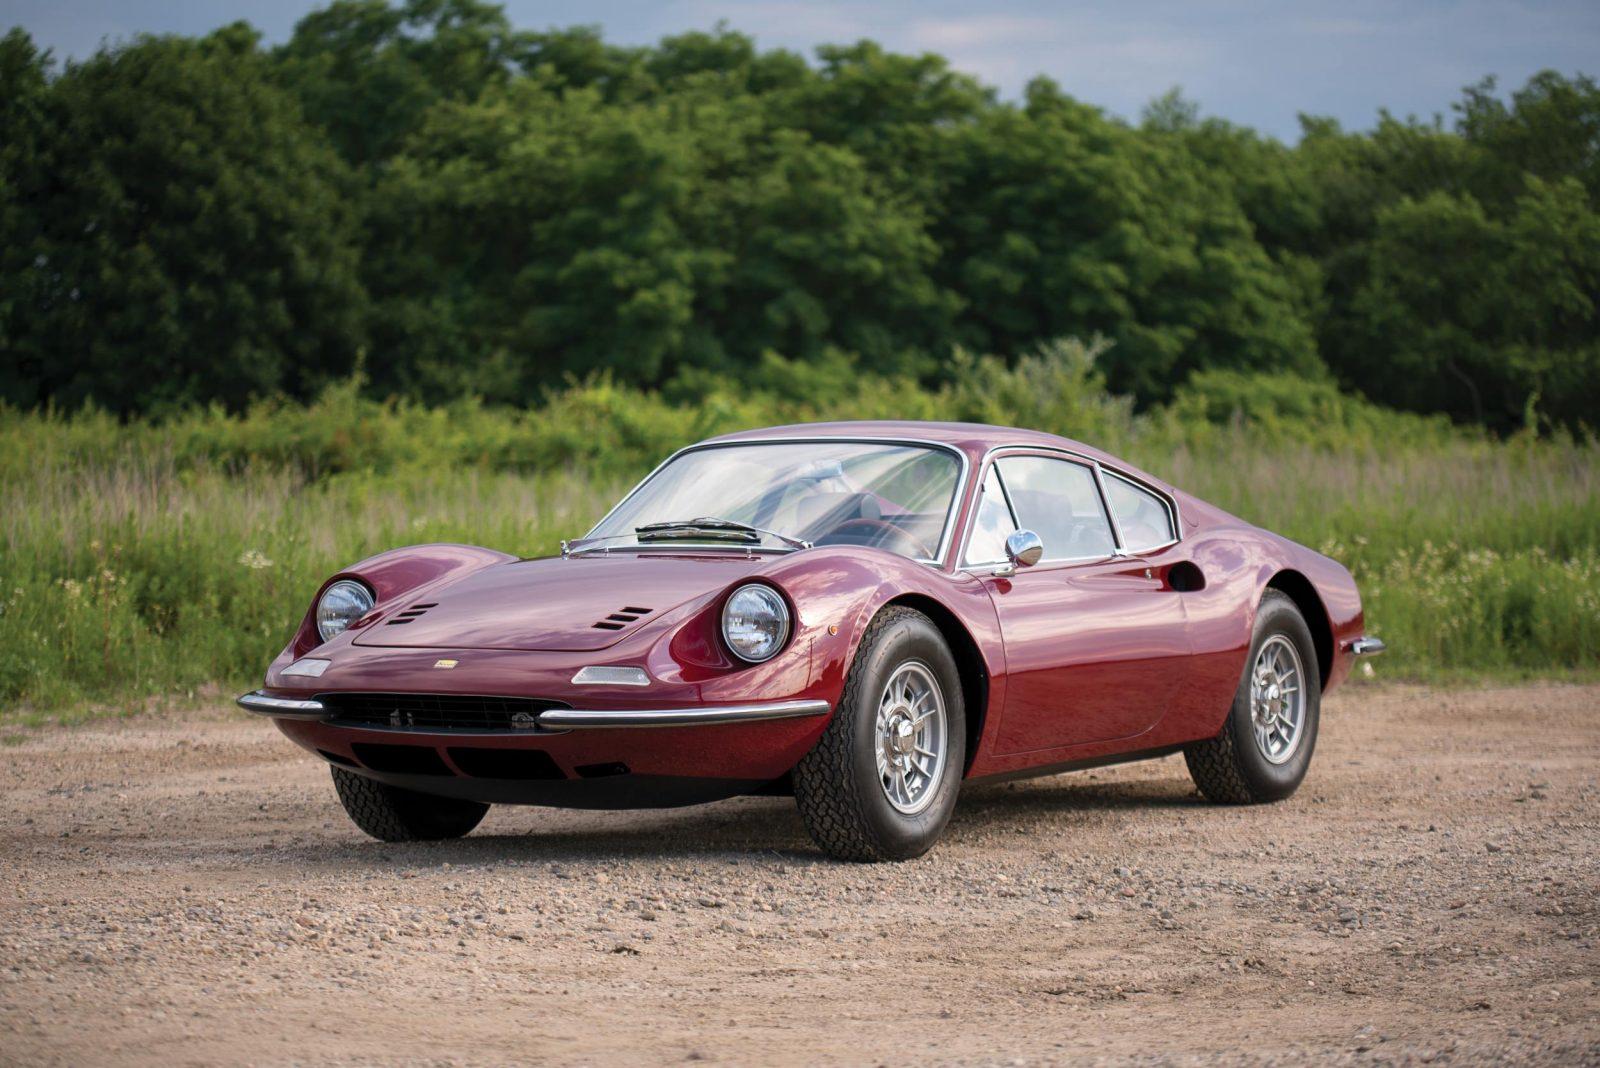 ferrari dino 246 1 1600x1068 - 1969 Ferrari Dino 246 GT